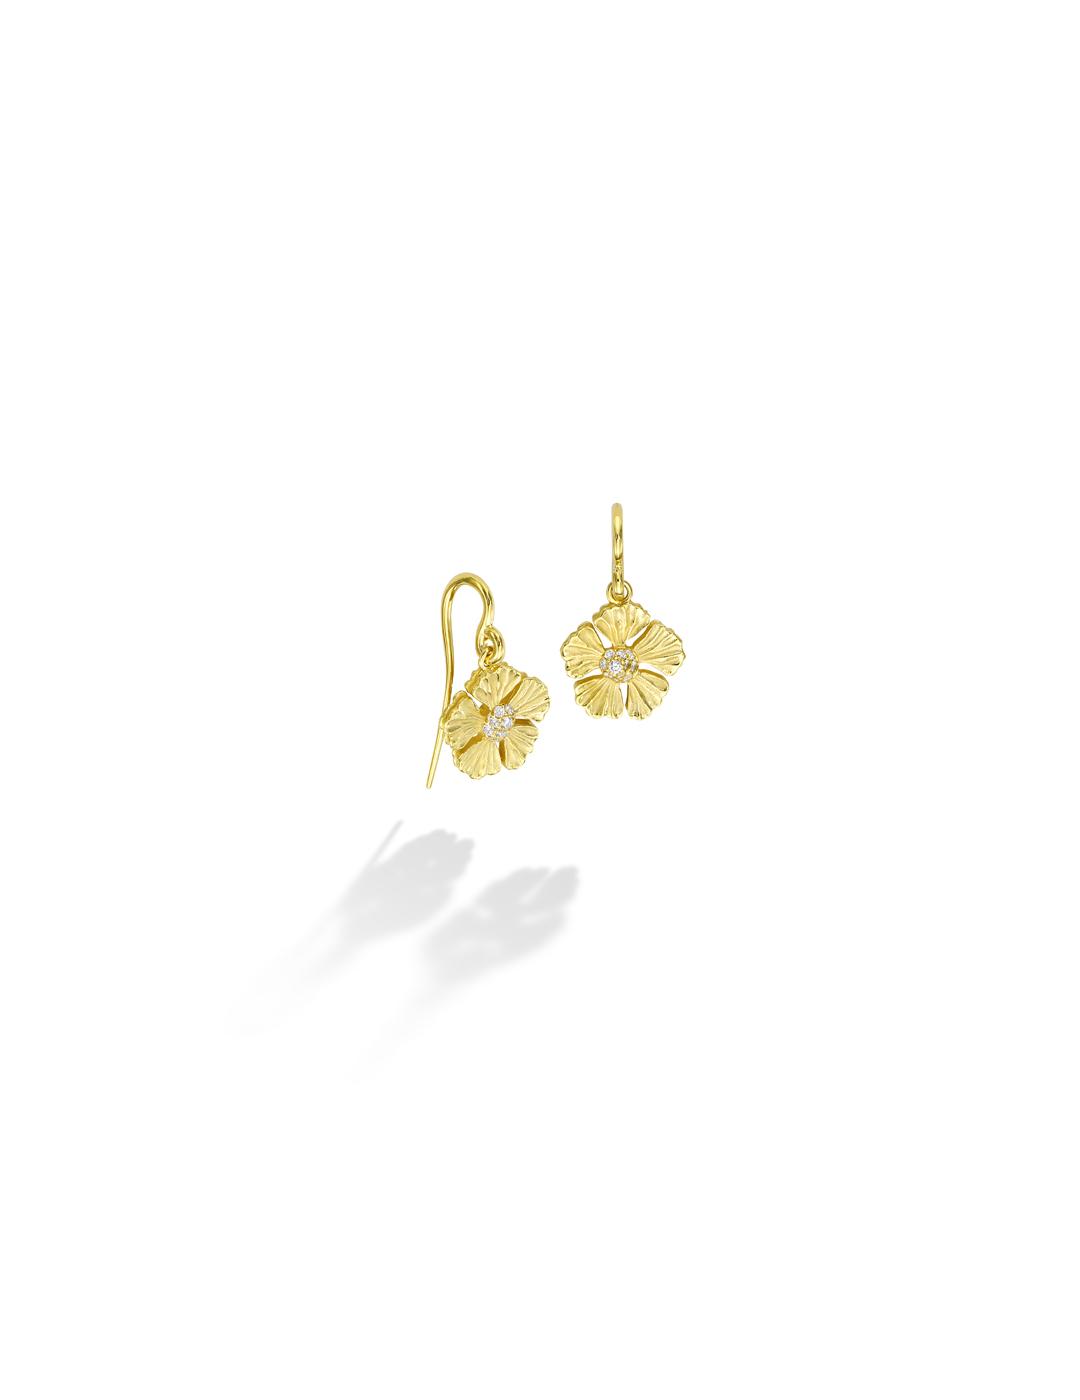 mish_products_earrings_StrwFlwer-XL-FW-1